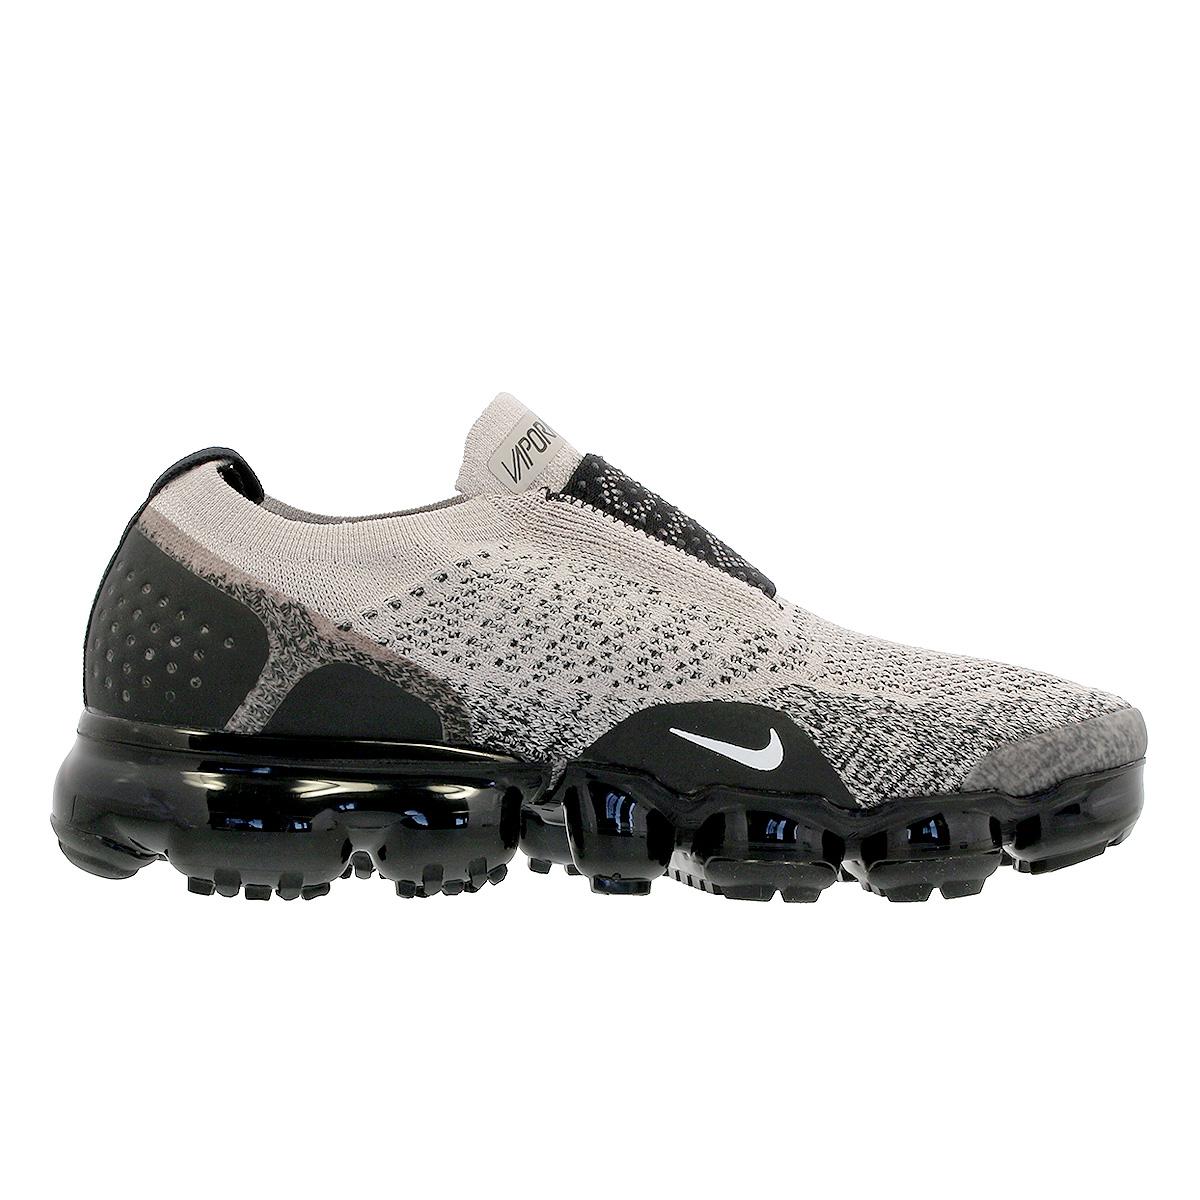 c598a178ef19f NIKE WMNS AIR VAPORMAX FK MOC 2 Nike women air vapor max mock 2 MOON  PARTICLE WHITE BLACK aj6599-202